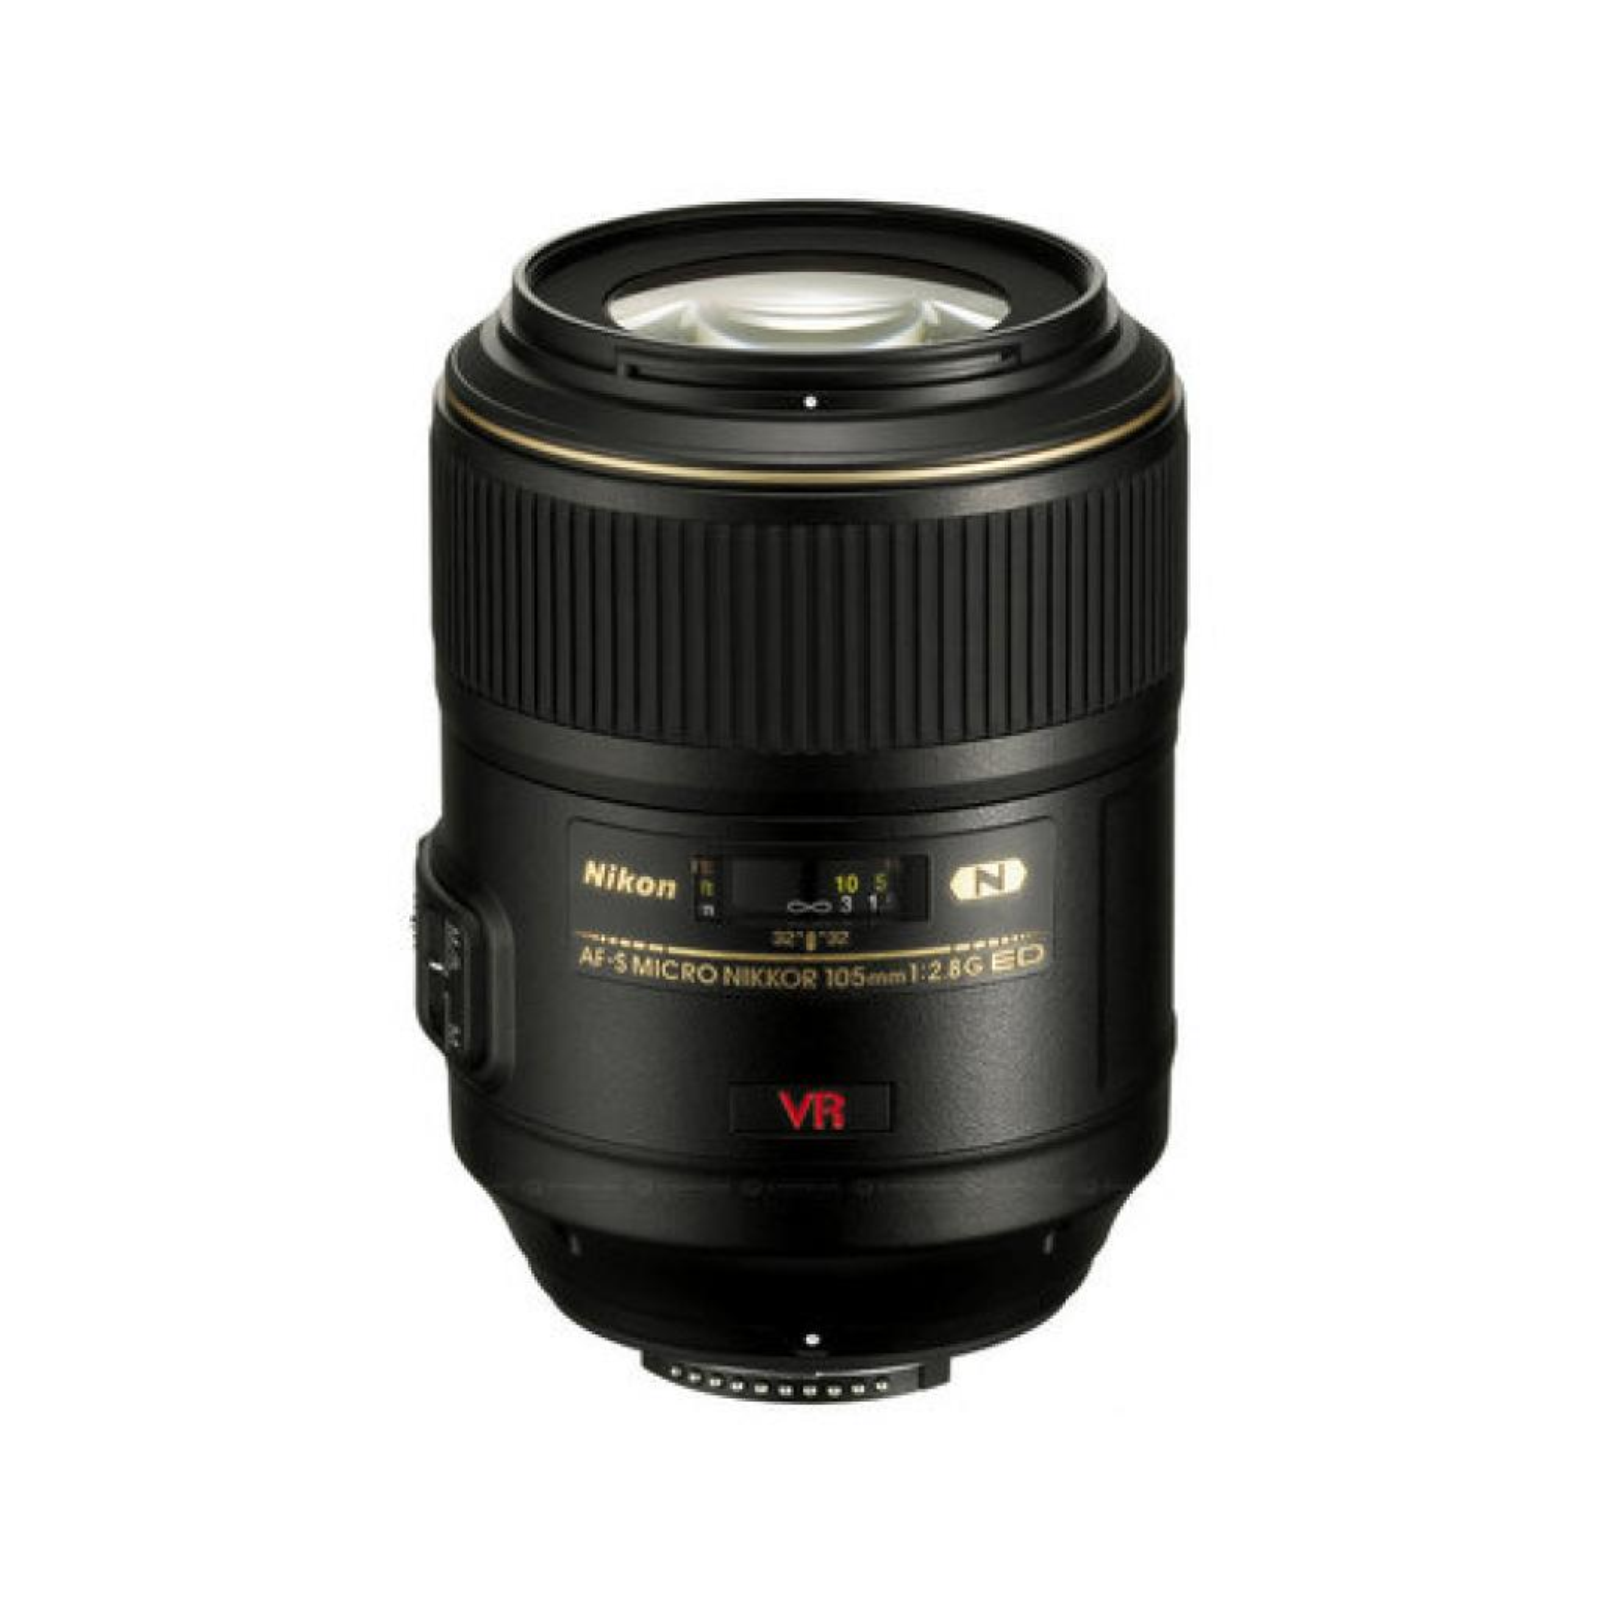 Объектив Nikkor AF-S 105mm f/2.8G IF-ED VRII Nikon (JAA630DA)